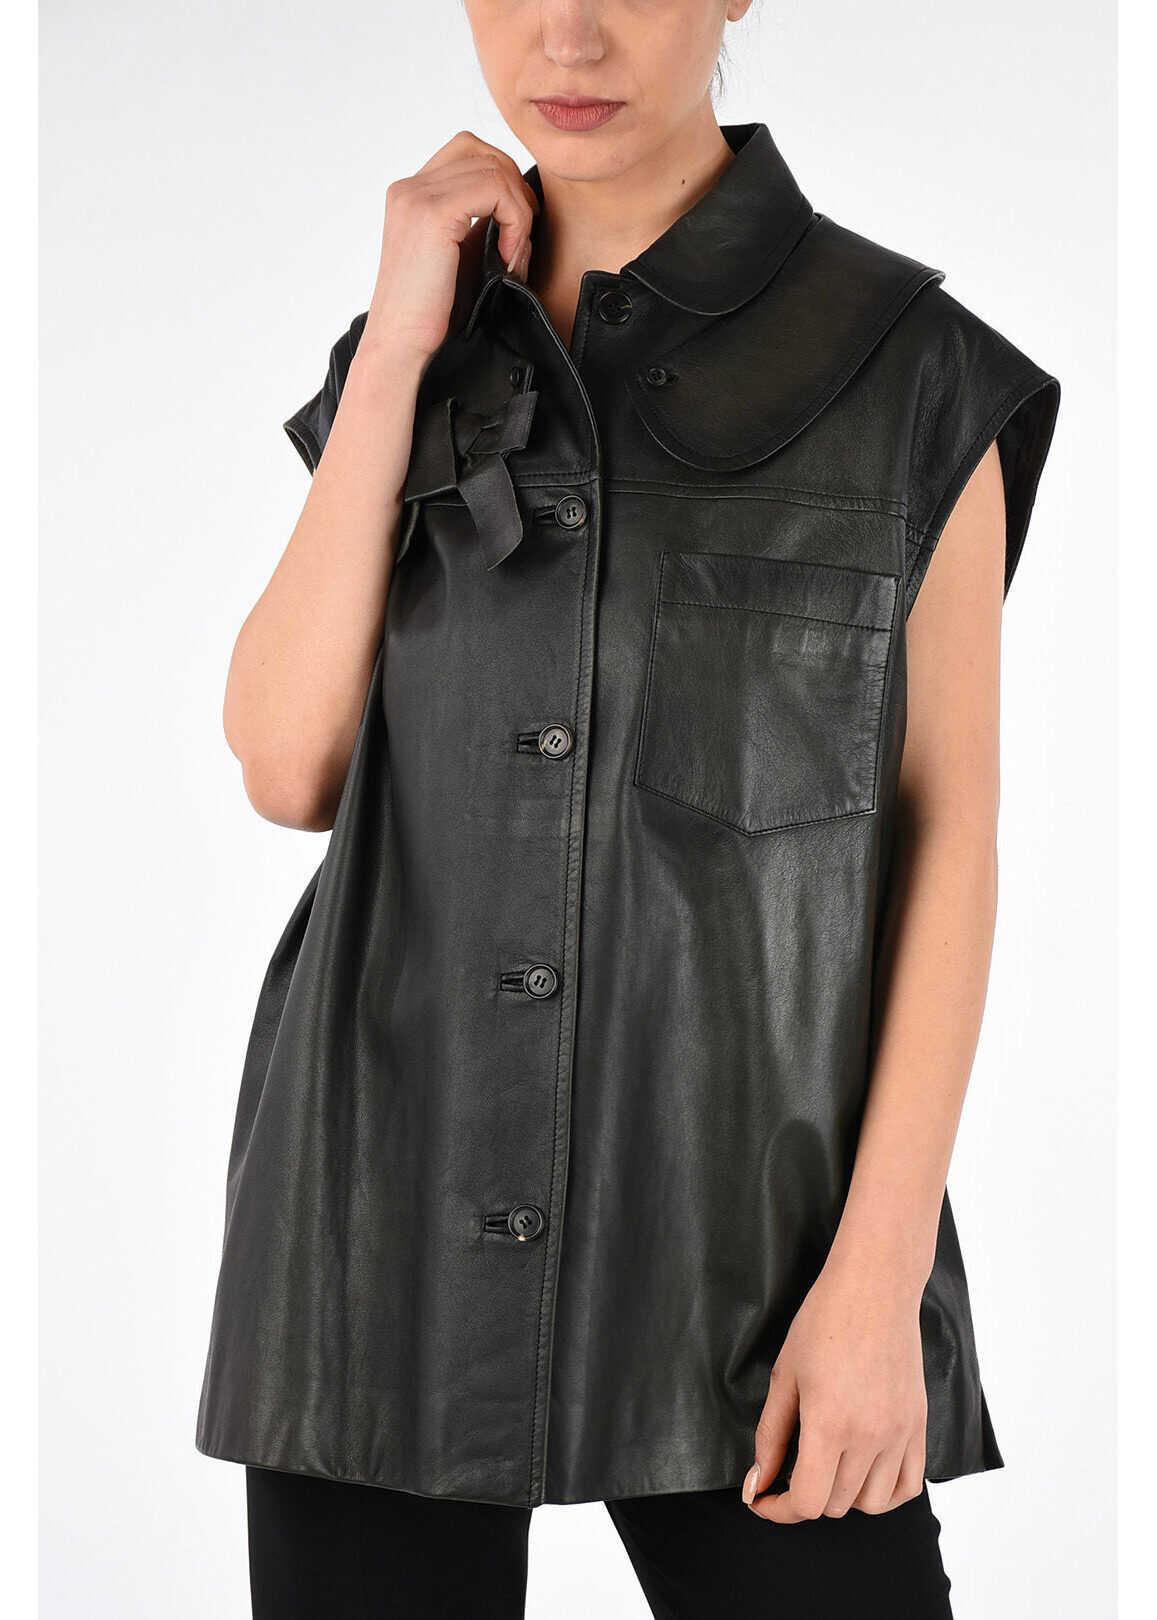 Miu Miu Leather Gilet DARK GRAY